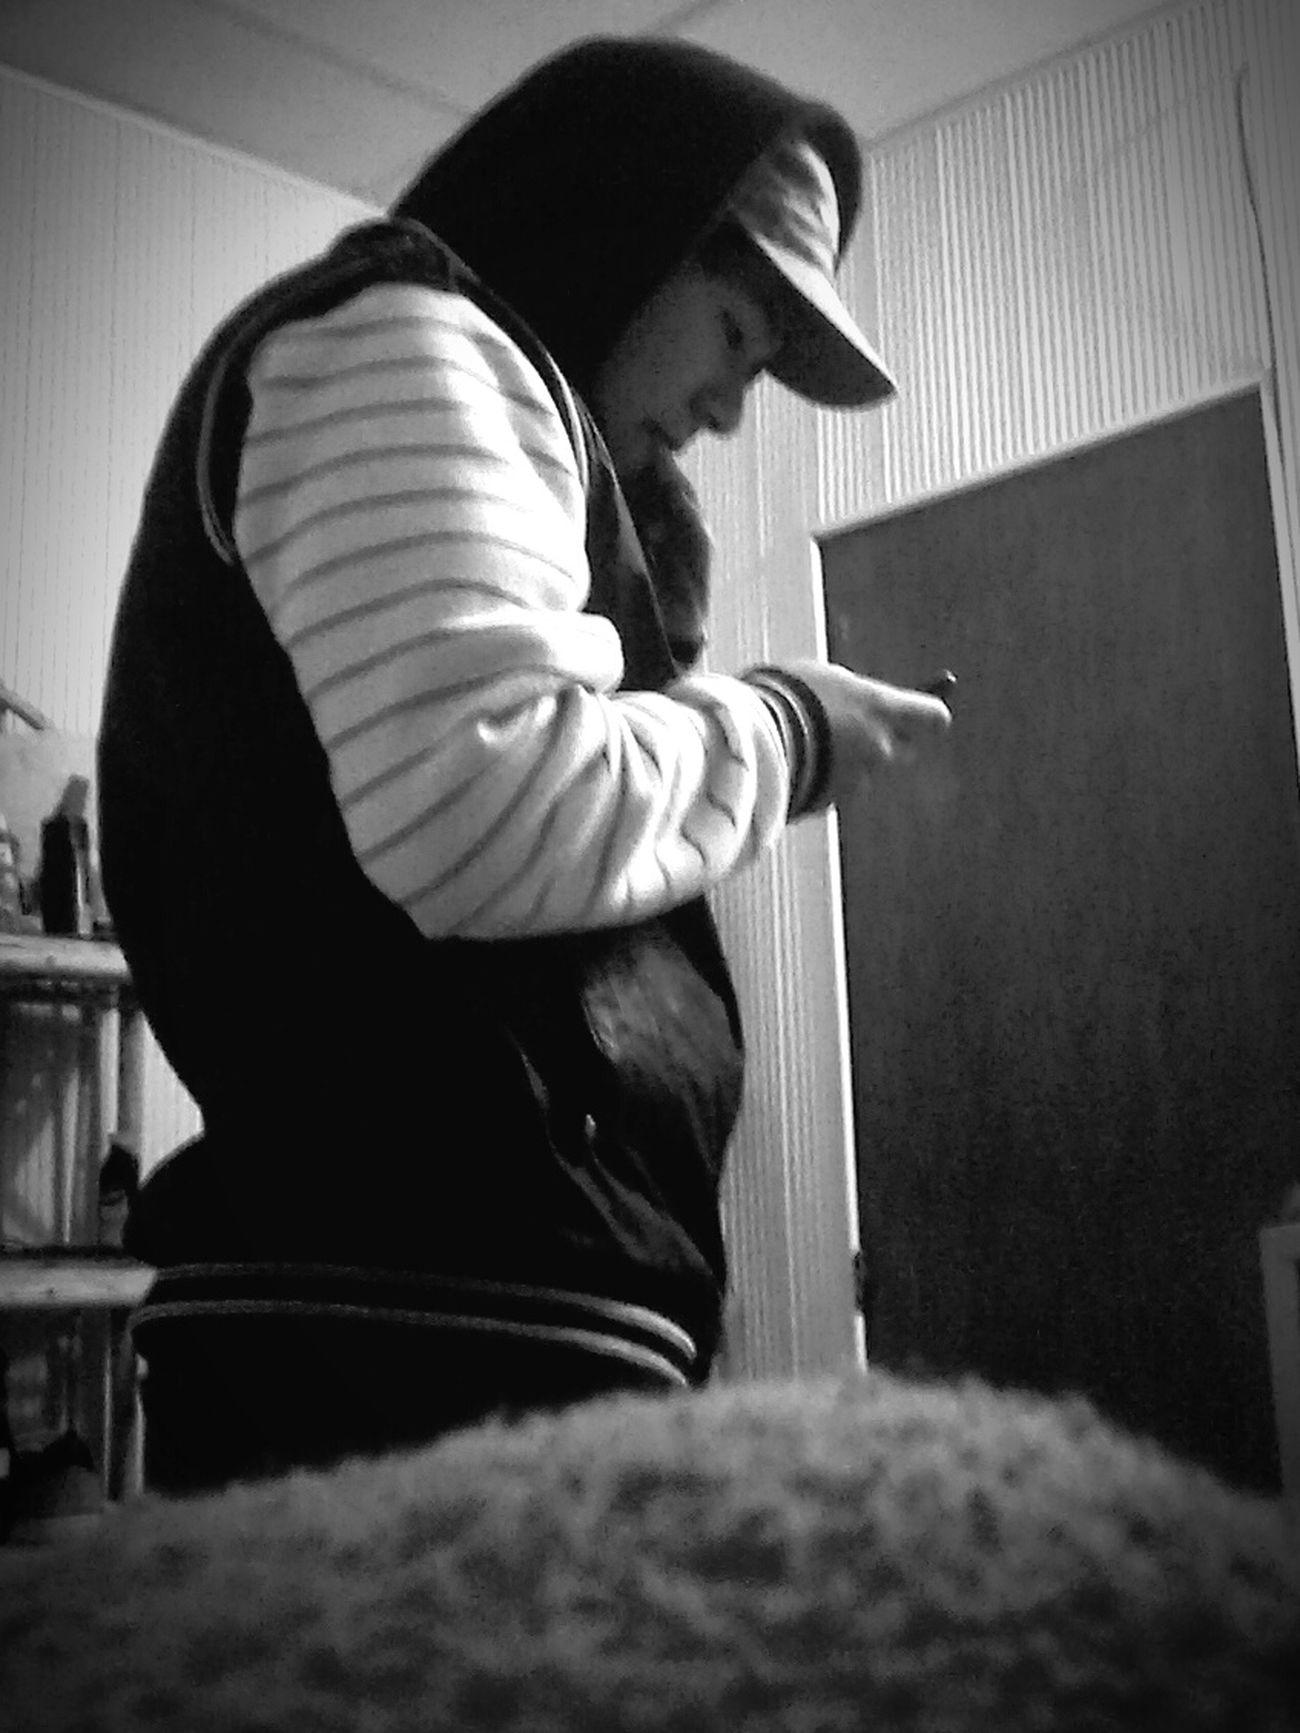 Hay un ladron (chorro turro) en mi piesa D': Ayuda Me Roban Chau RiBer XD